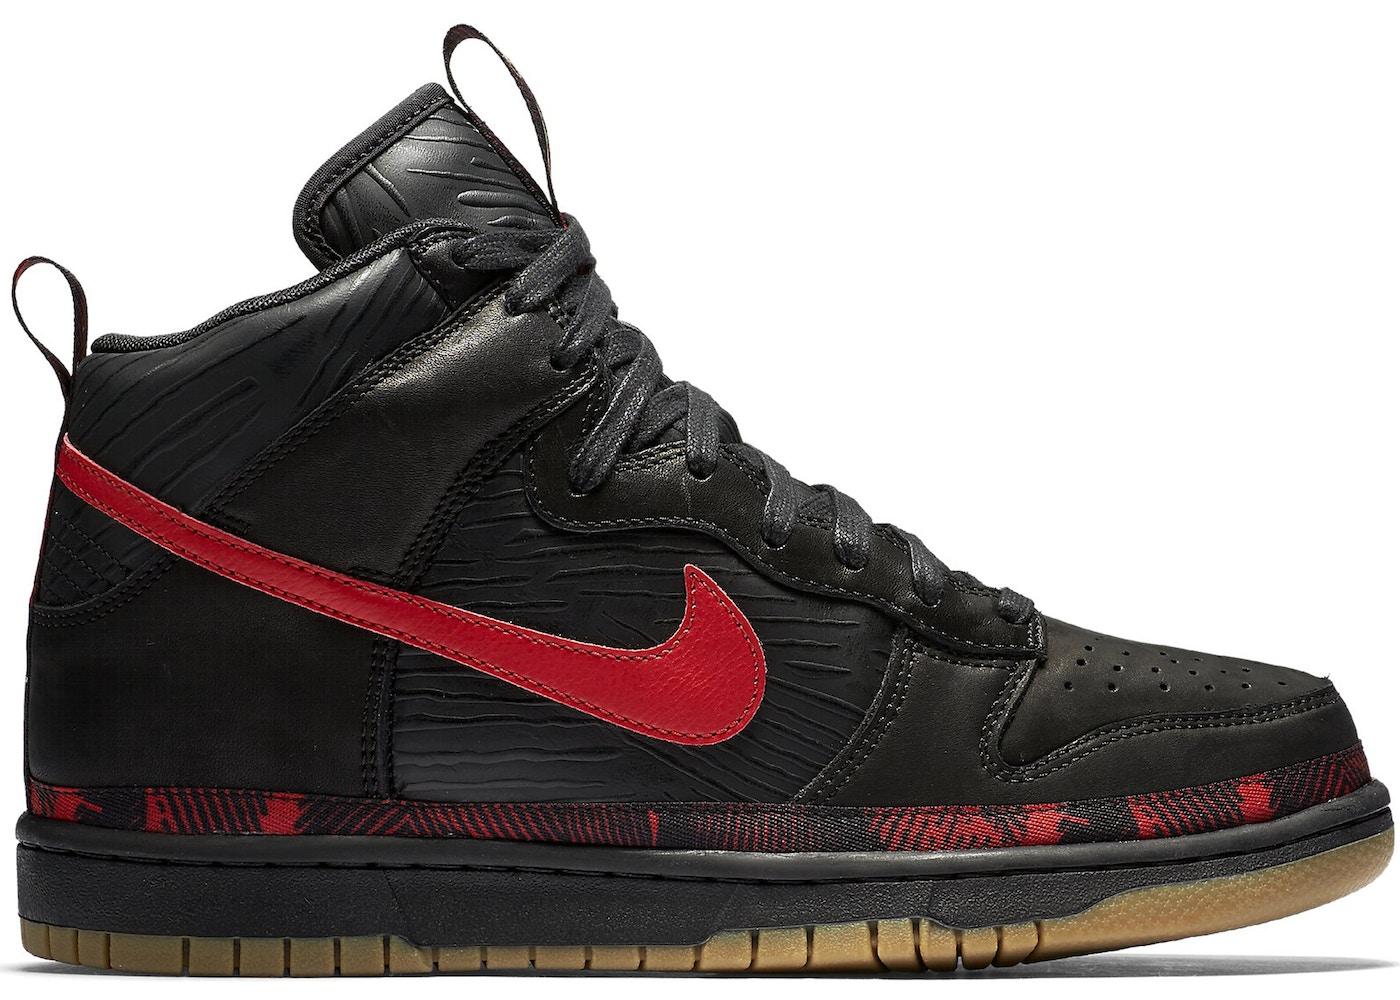 super popular ce6ba 523e9 Buy Nike Basketball Dunk Shoes  Deadstock Sneakers